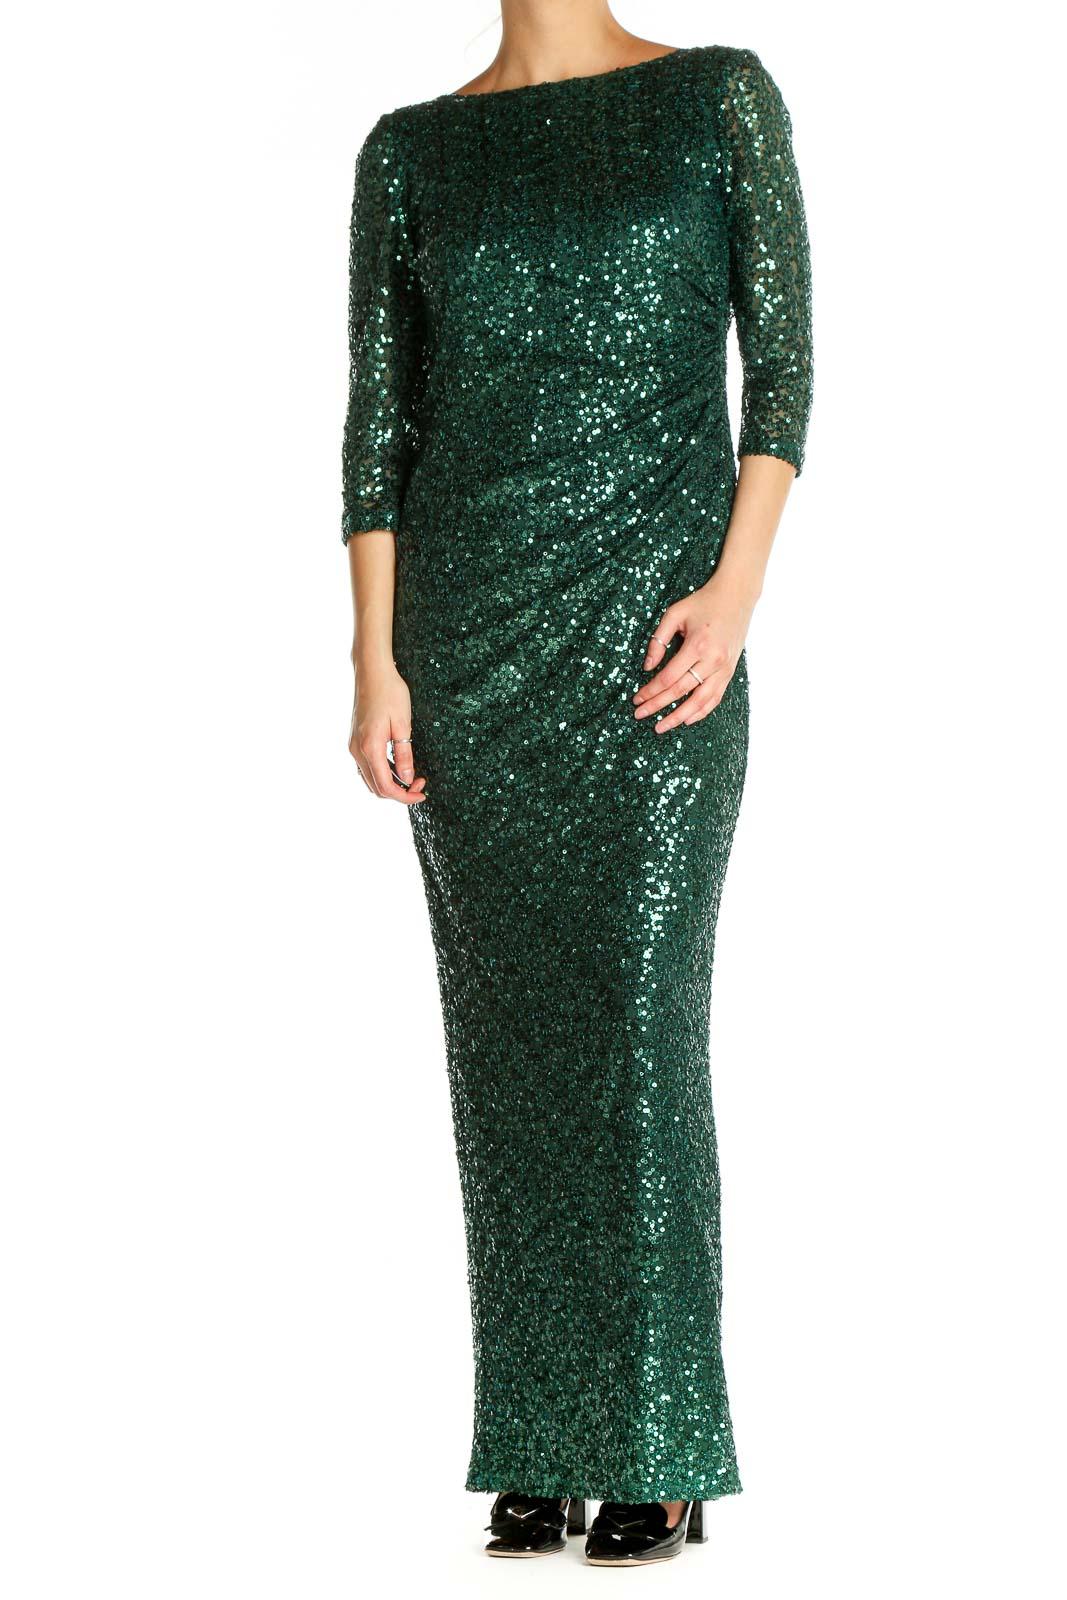 Green Sequin Classic Column Dress Front